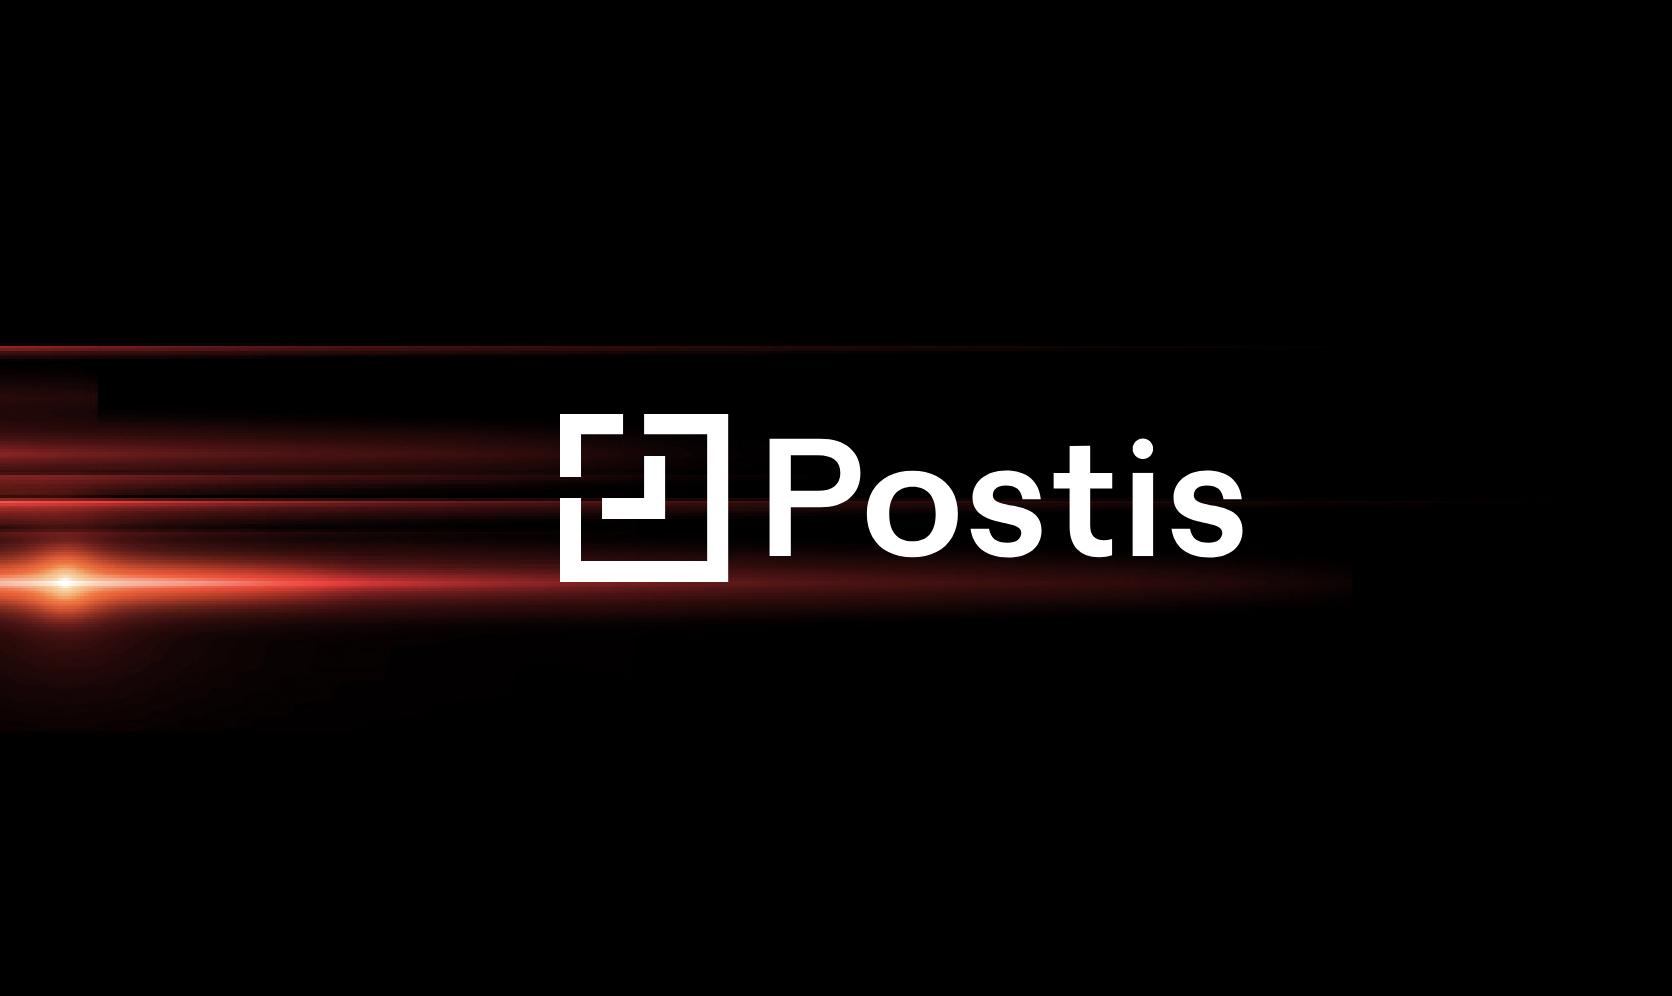 postis logo on dark background